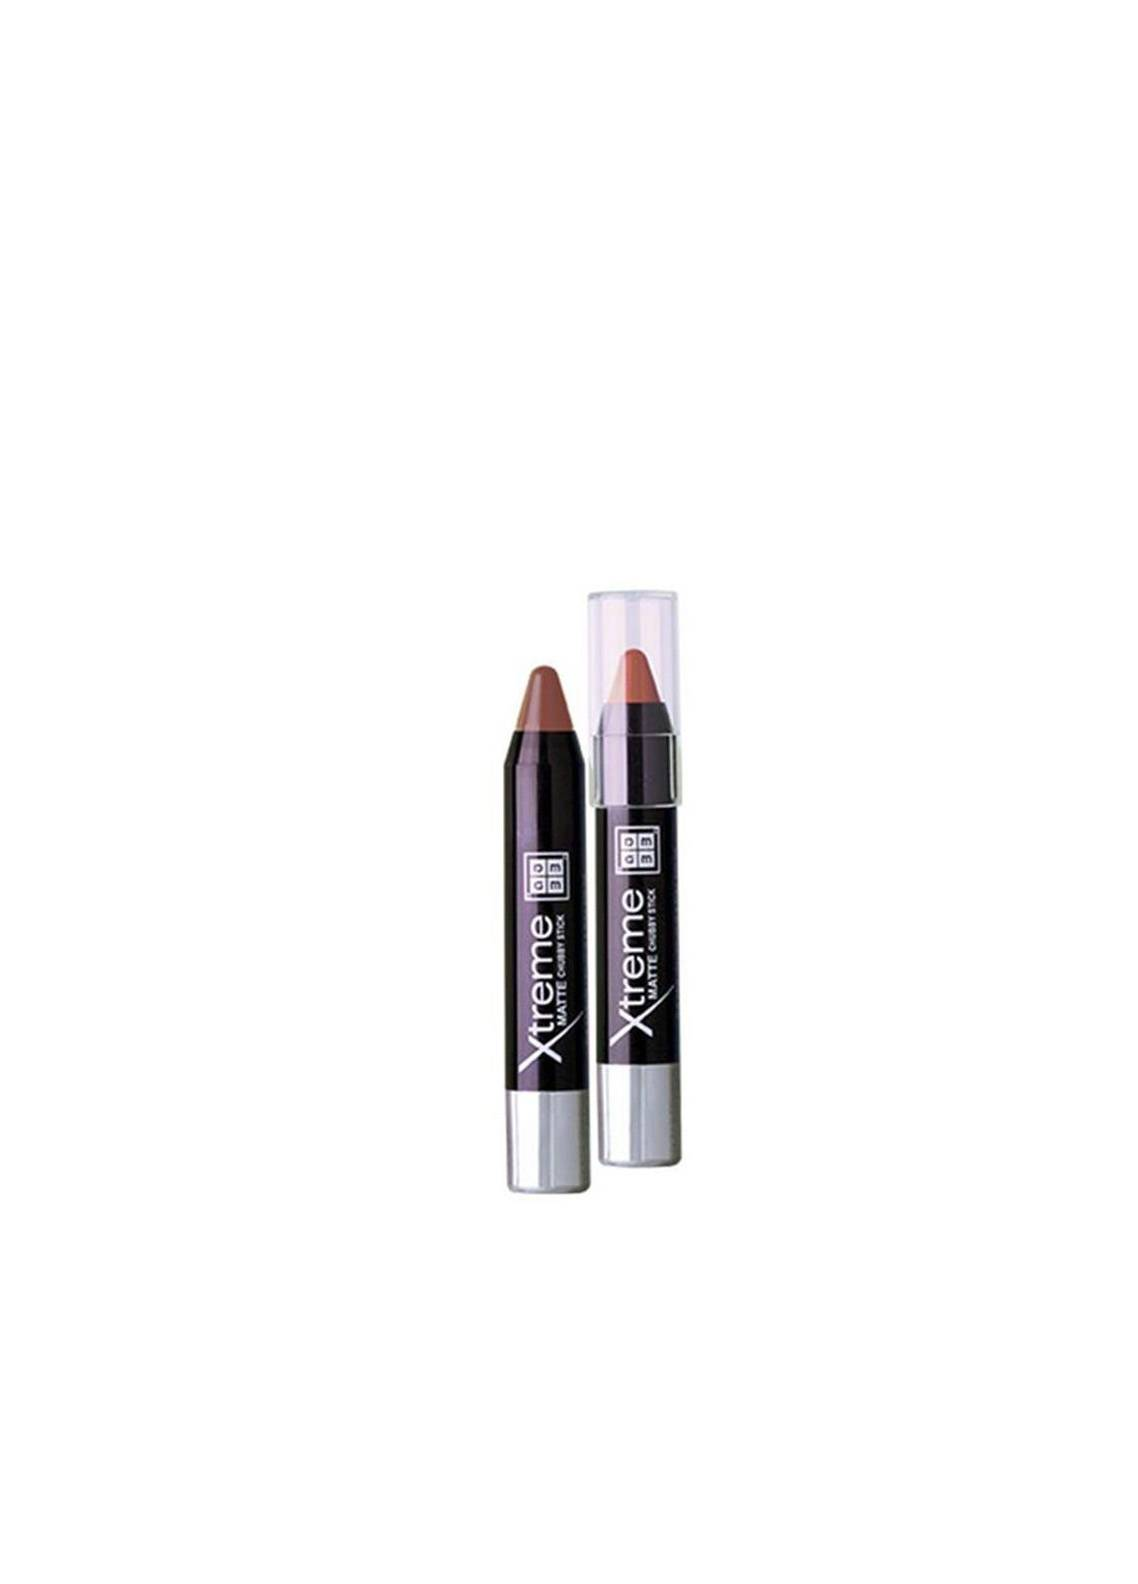 DMGM Extreme Chubby Lipstick - Choco Butternut 15